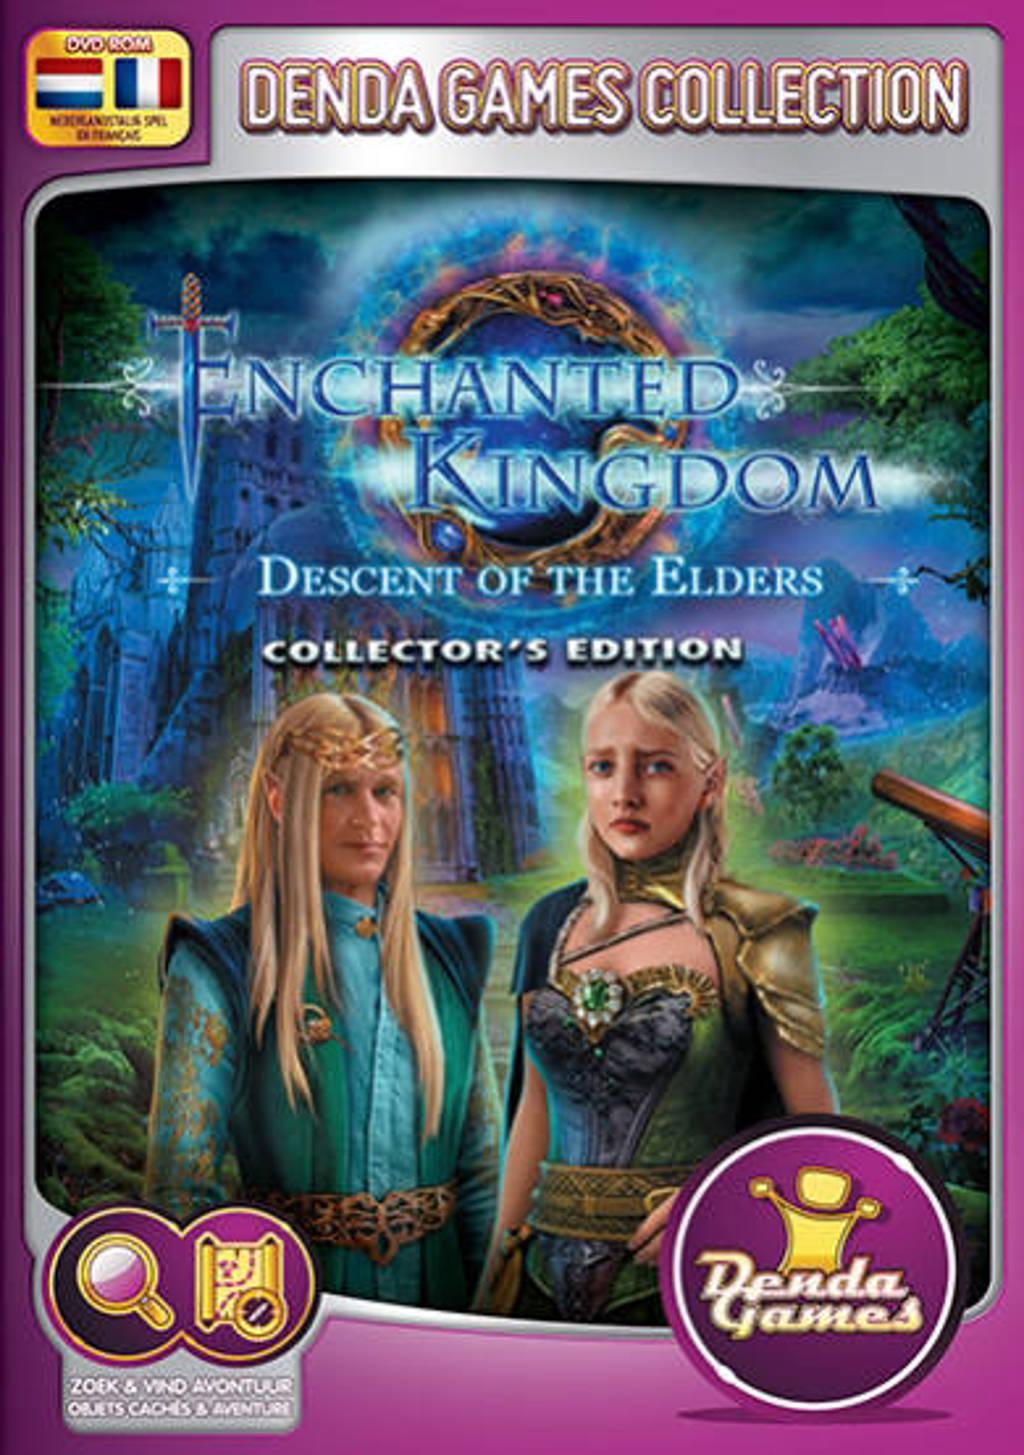 Enchanted kingdom - Descent of the elders (Collectors edition) (PC)